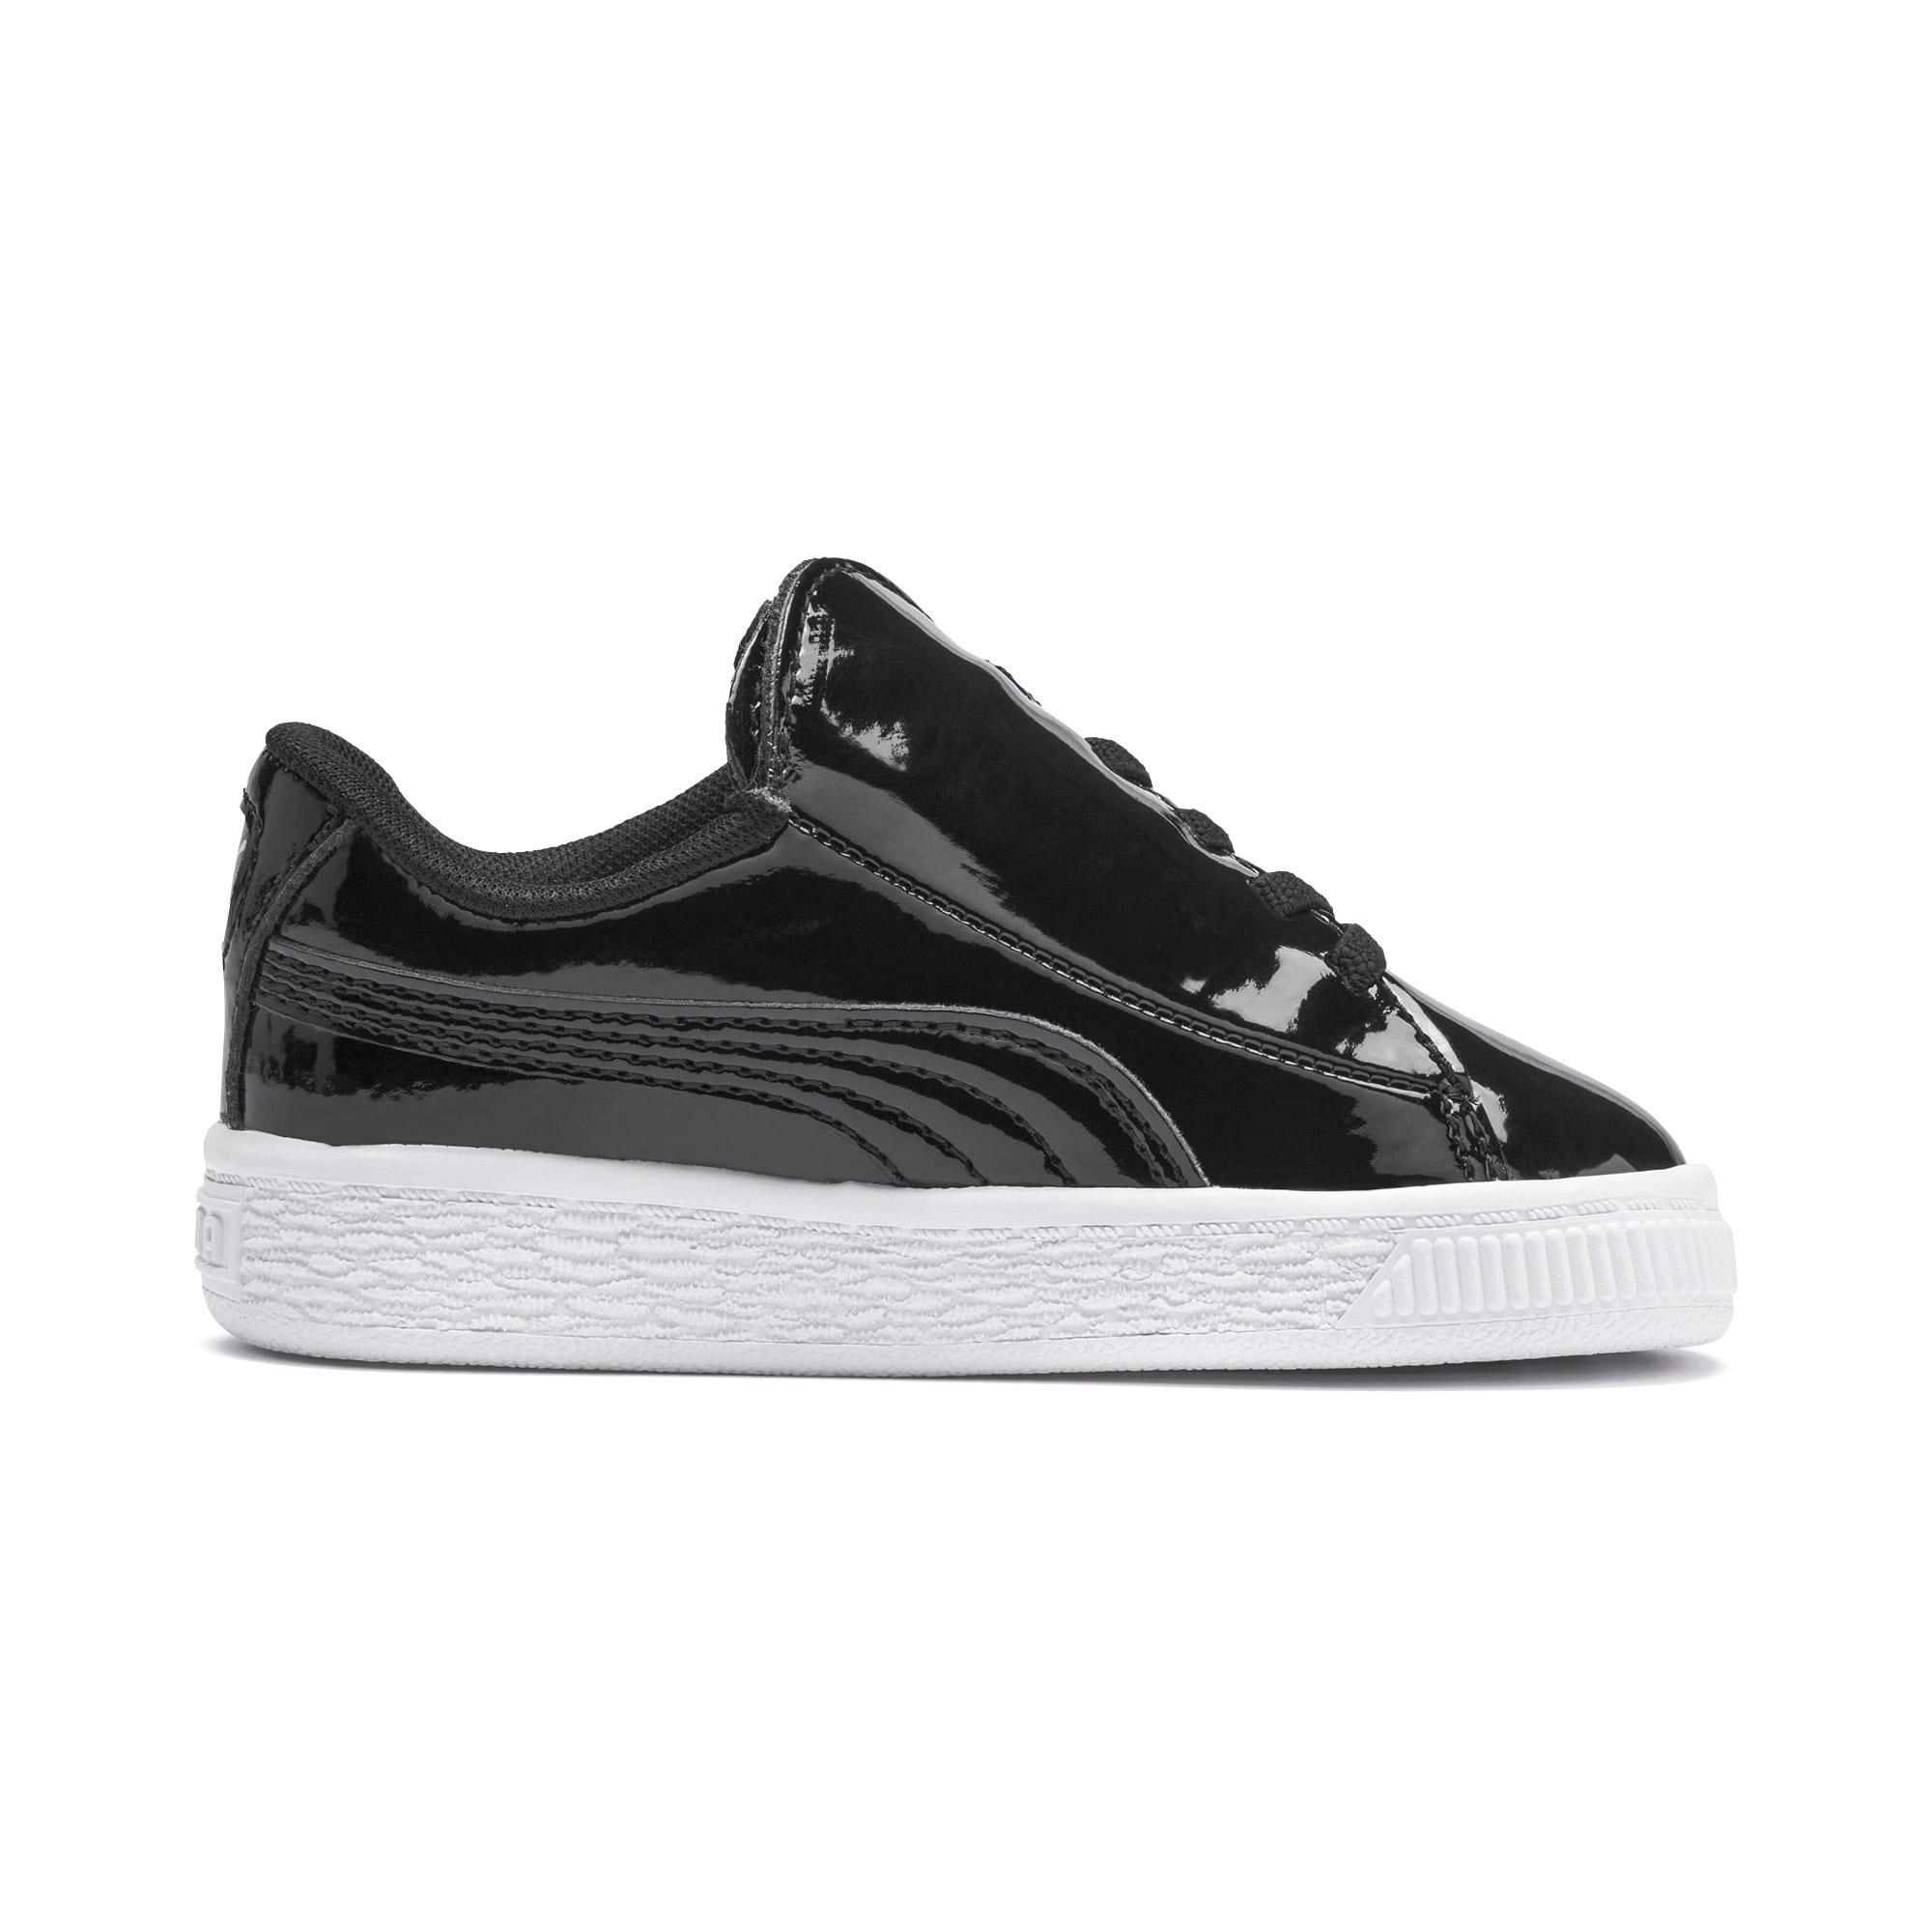 Thumbnail 5 of Basket Crush Patent AC Toddler Shoes, Puma Black-Puma White, medium